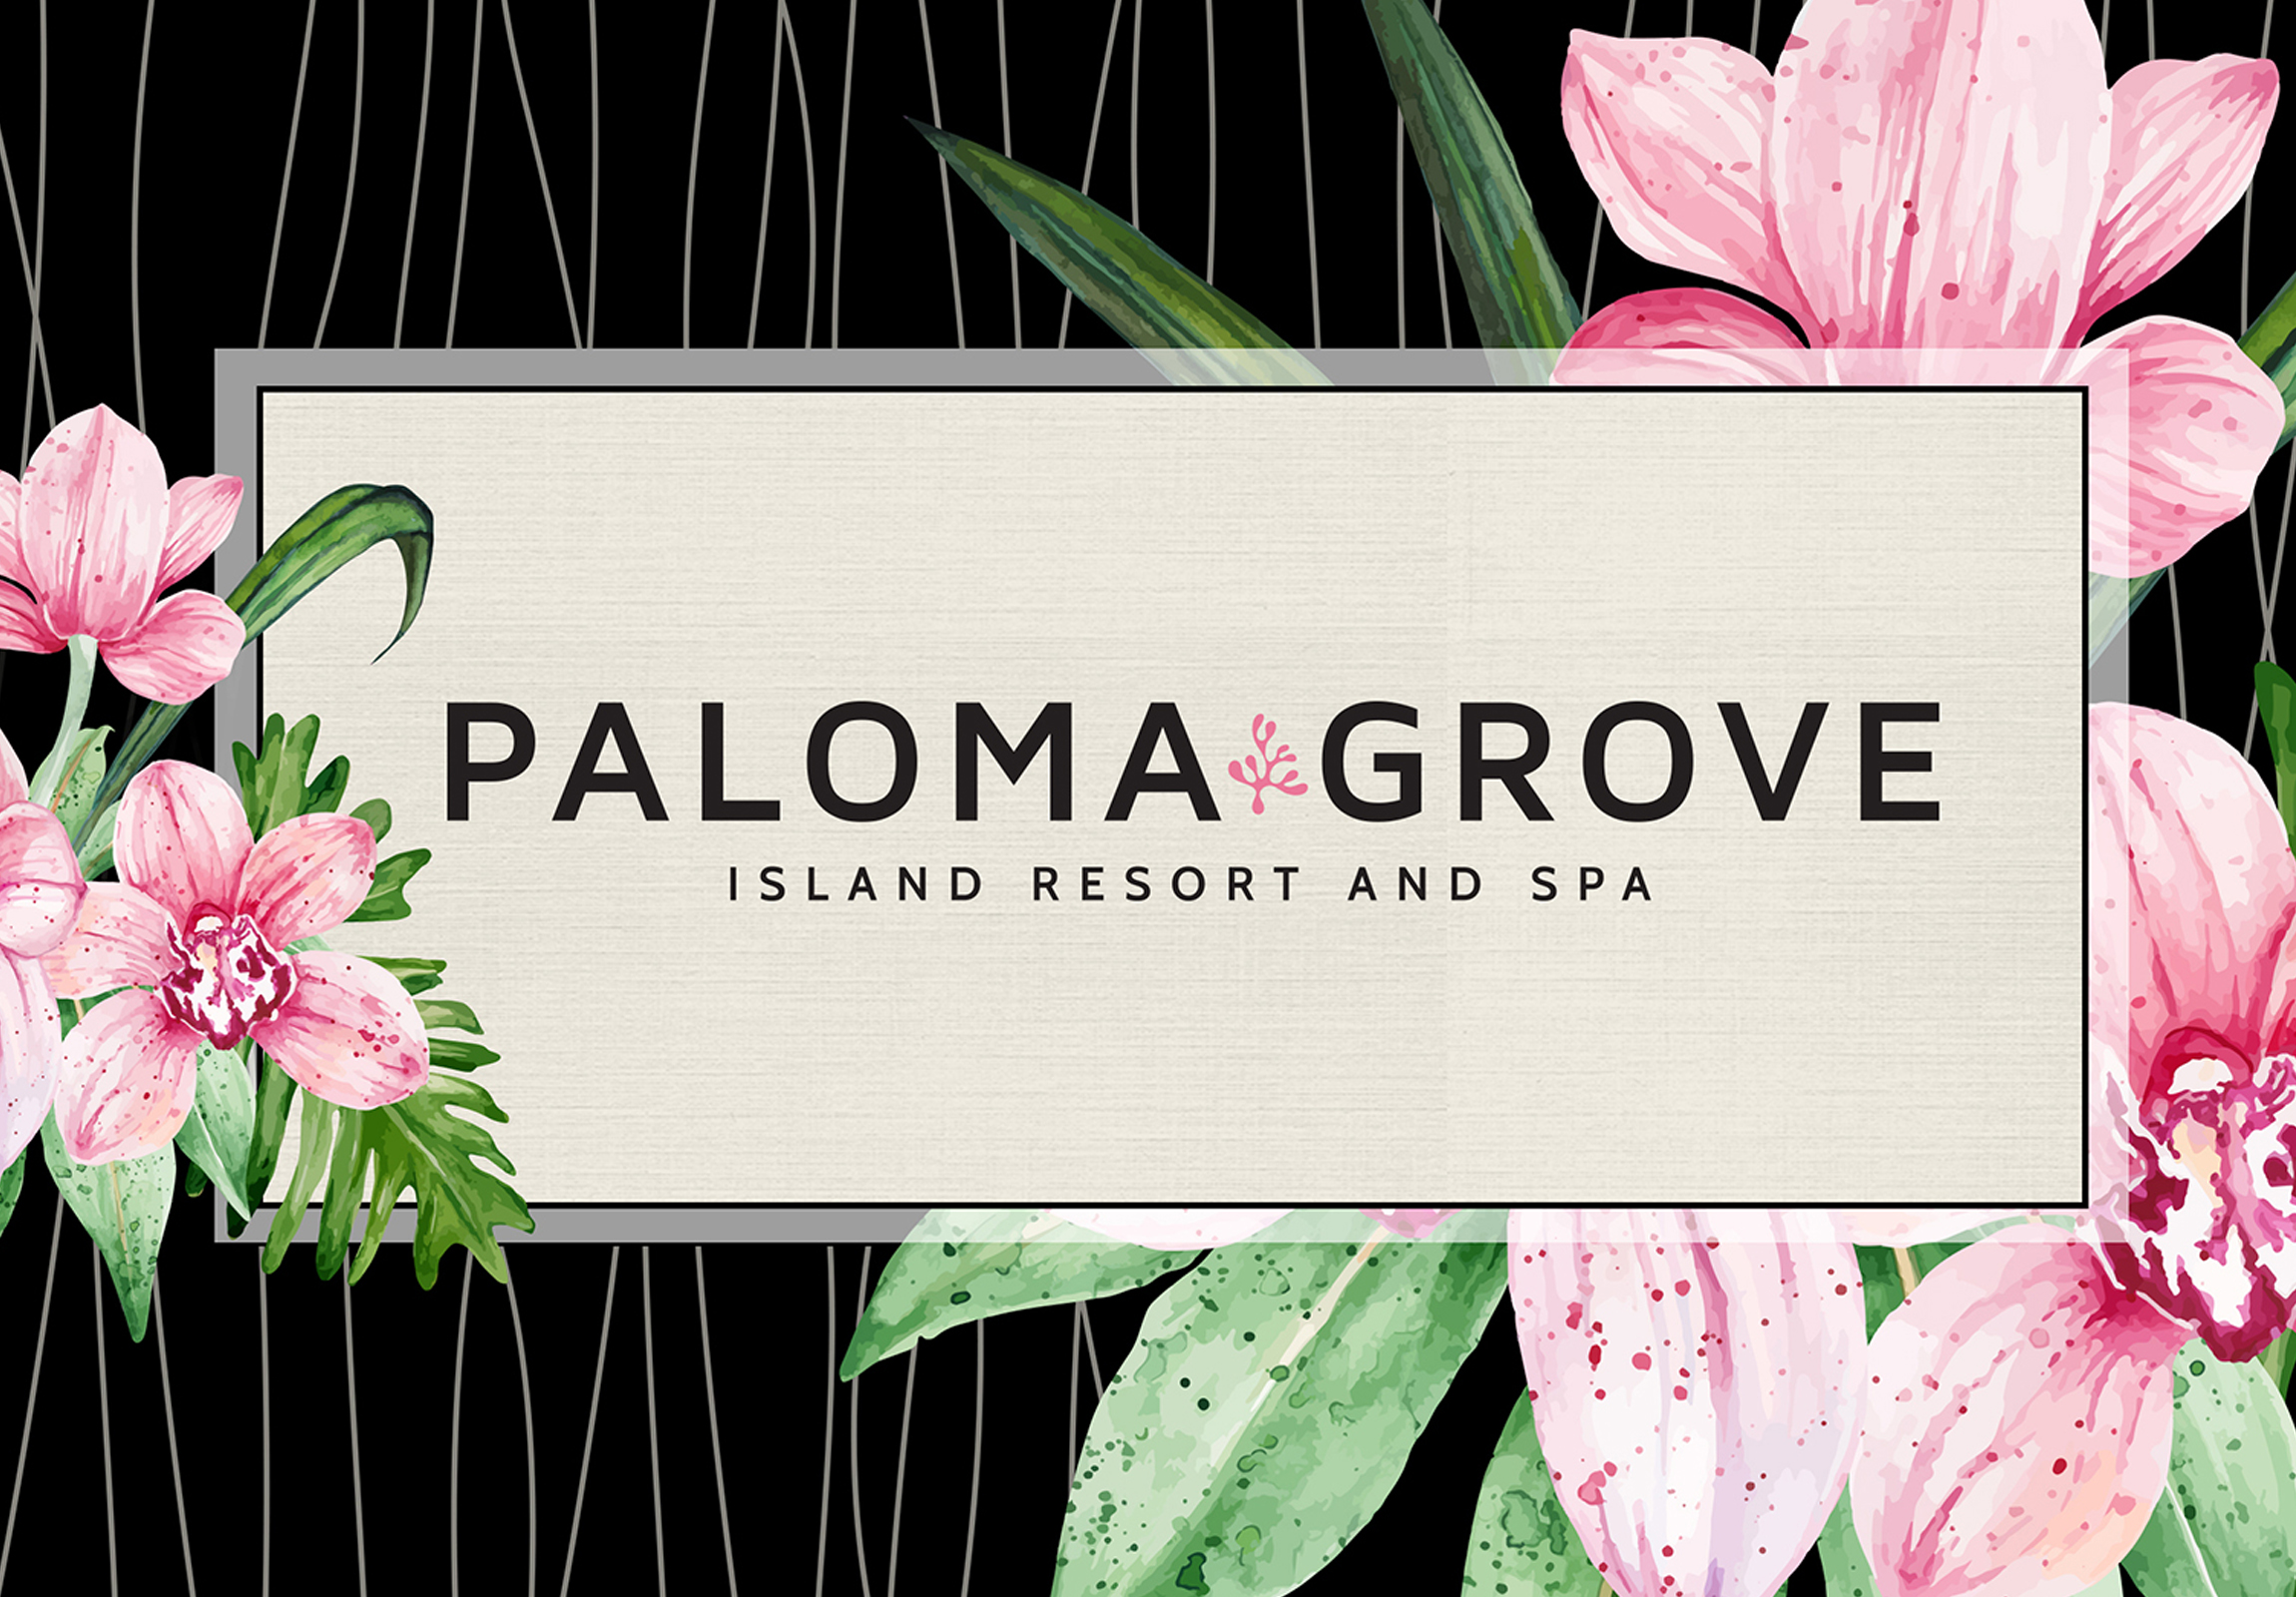 PALOMA GROVER